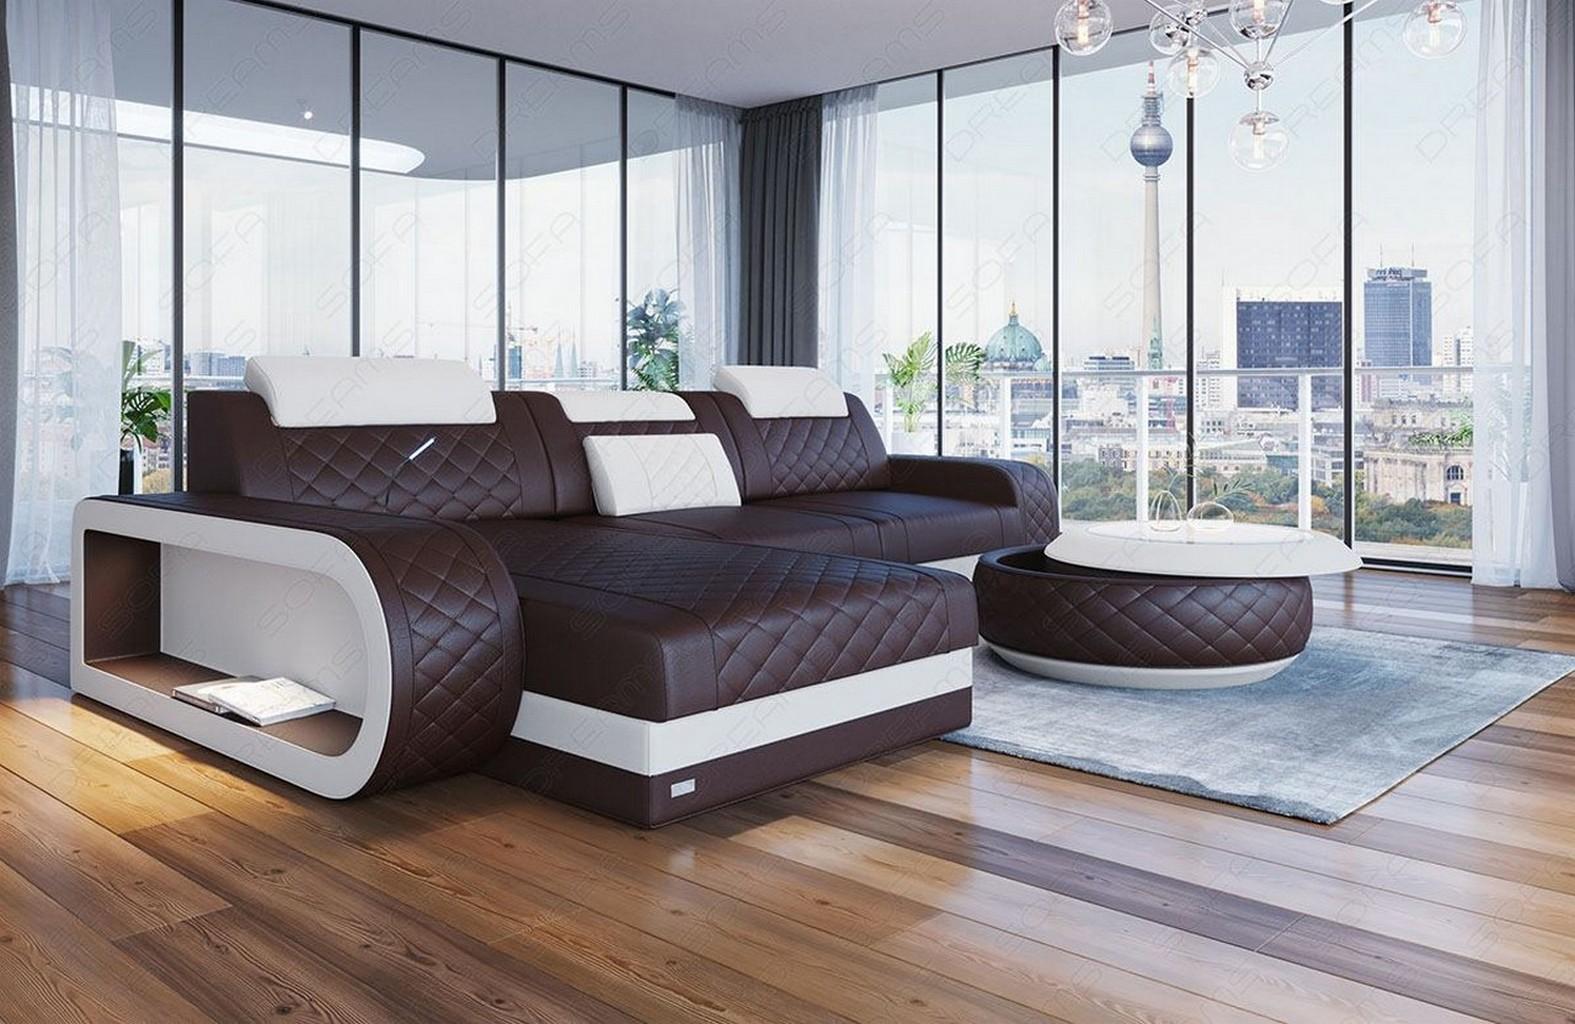 Ledersofa Eckcouch Sofa Design Luxus Couch BERLIN L Form